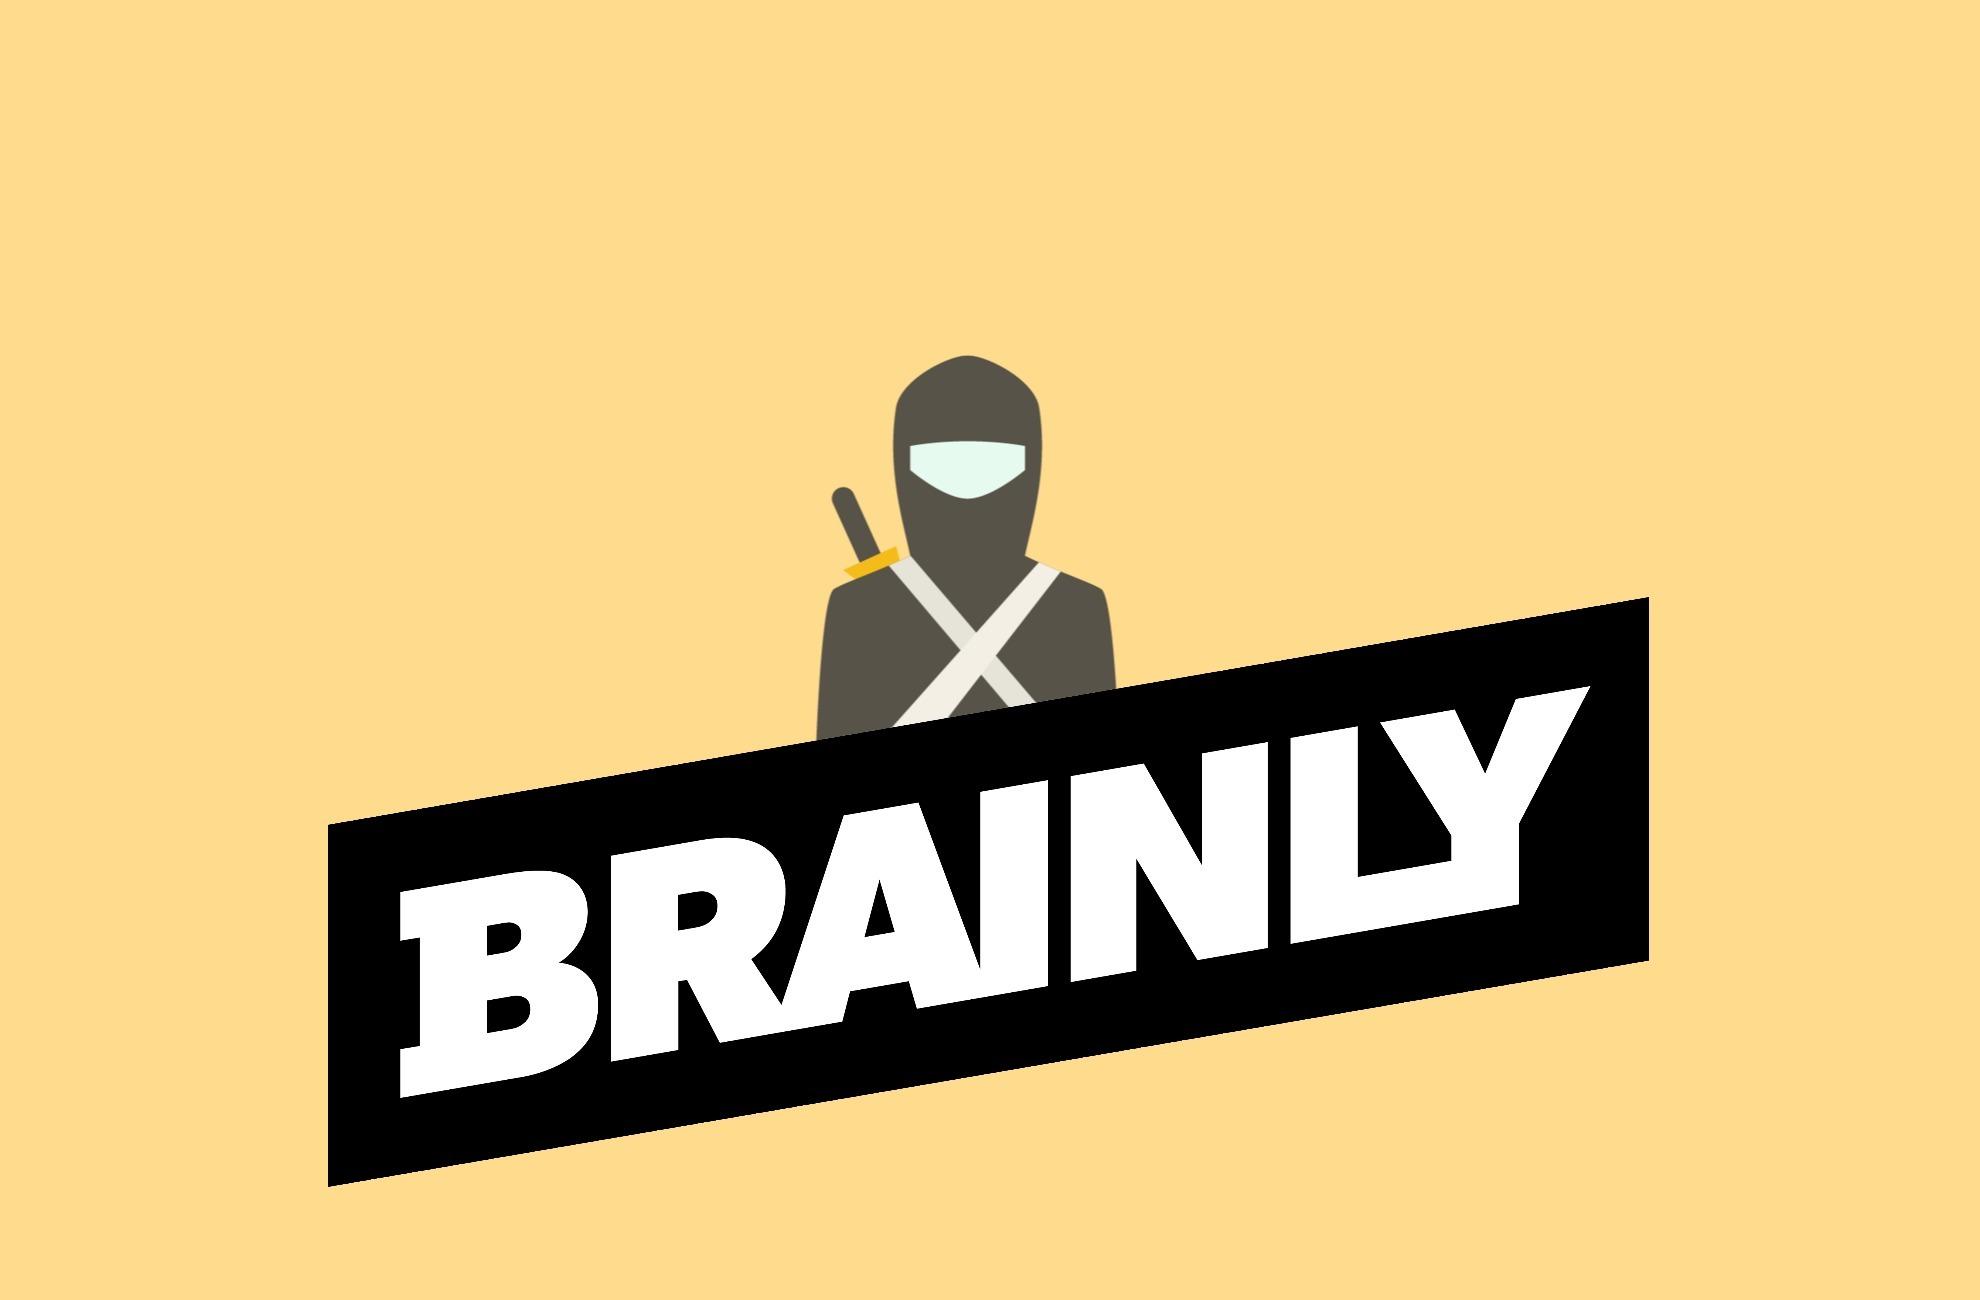 Contoh Tarian Yang Menggunakan Pola Lantai Horizontal Brainly Co Id